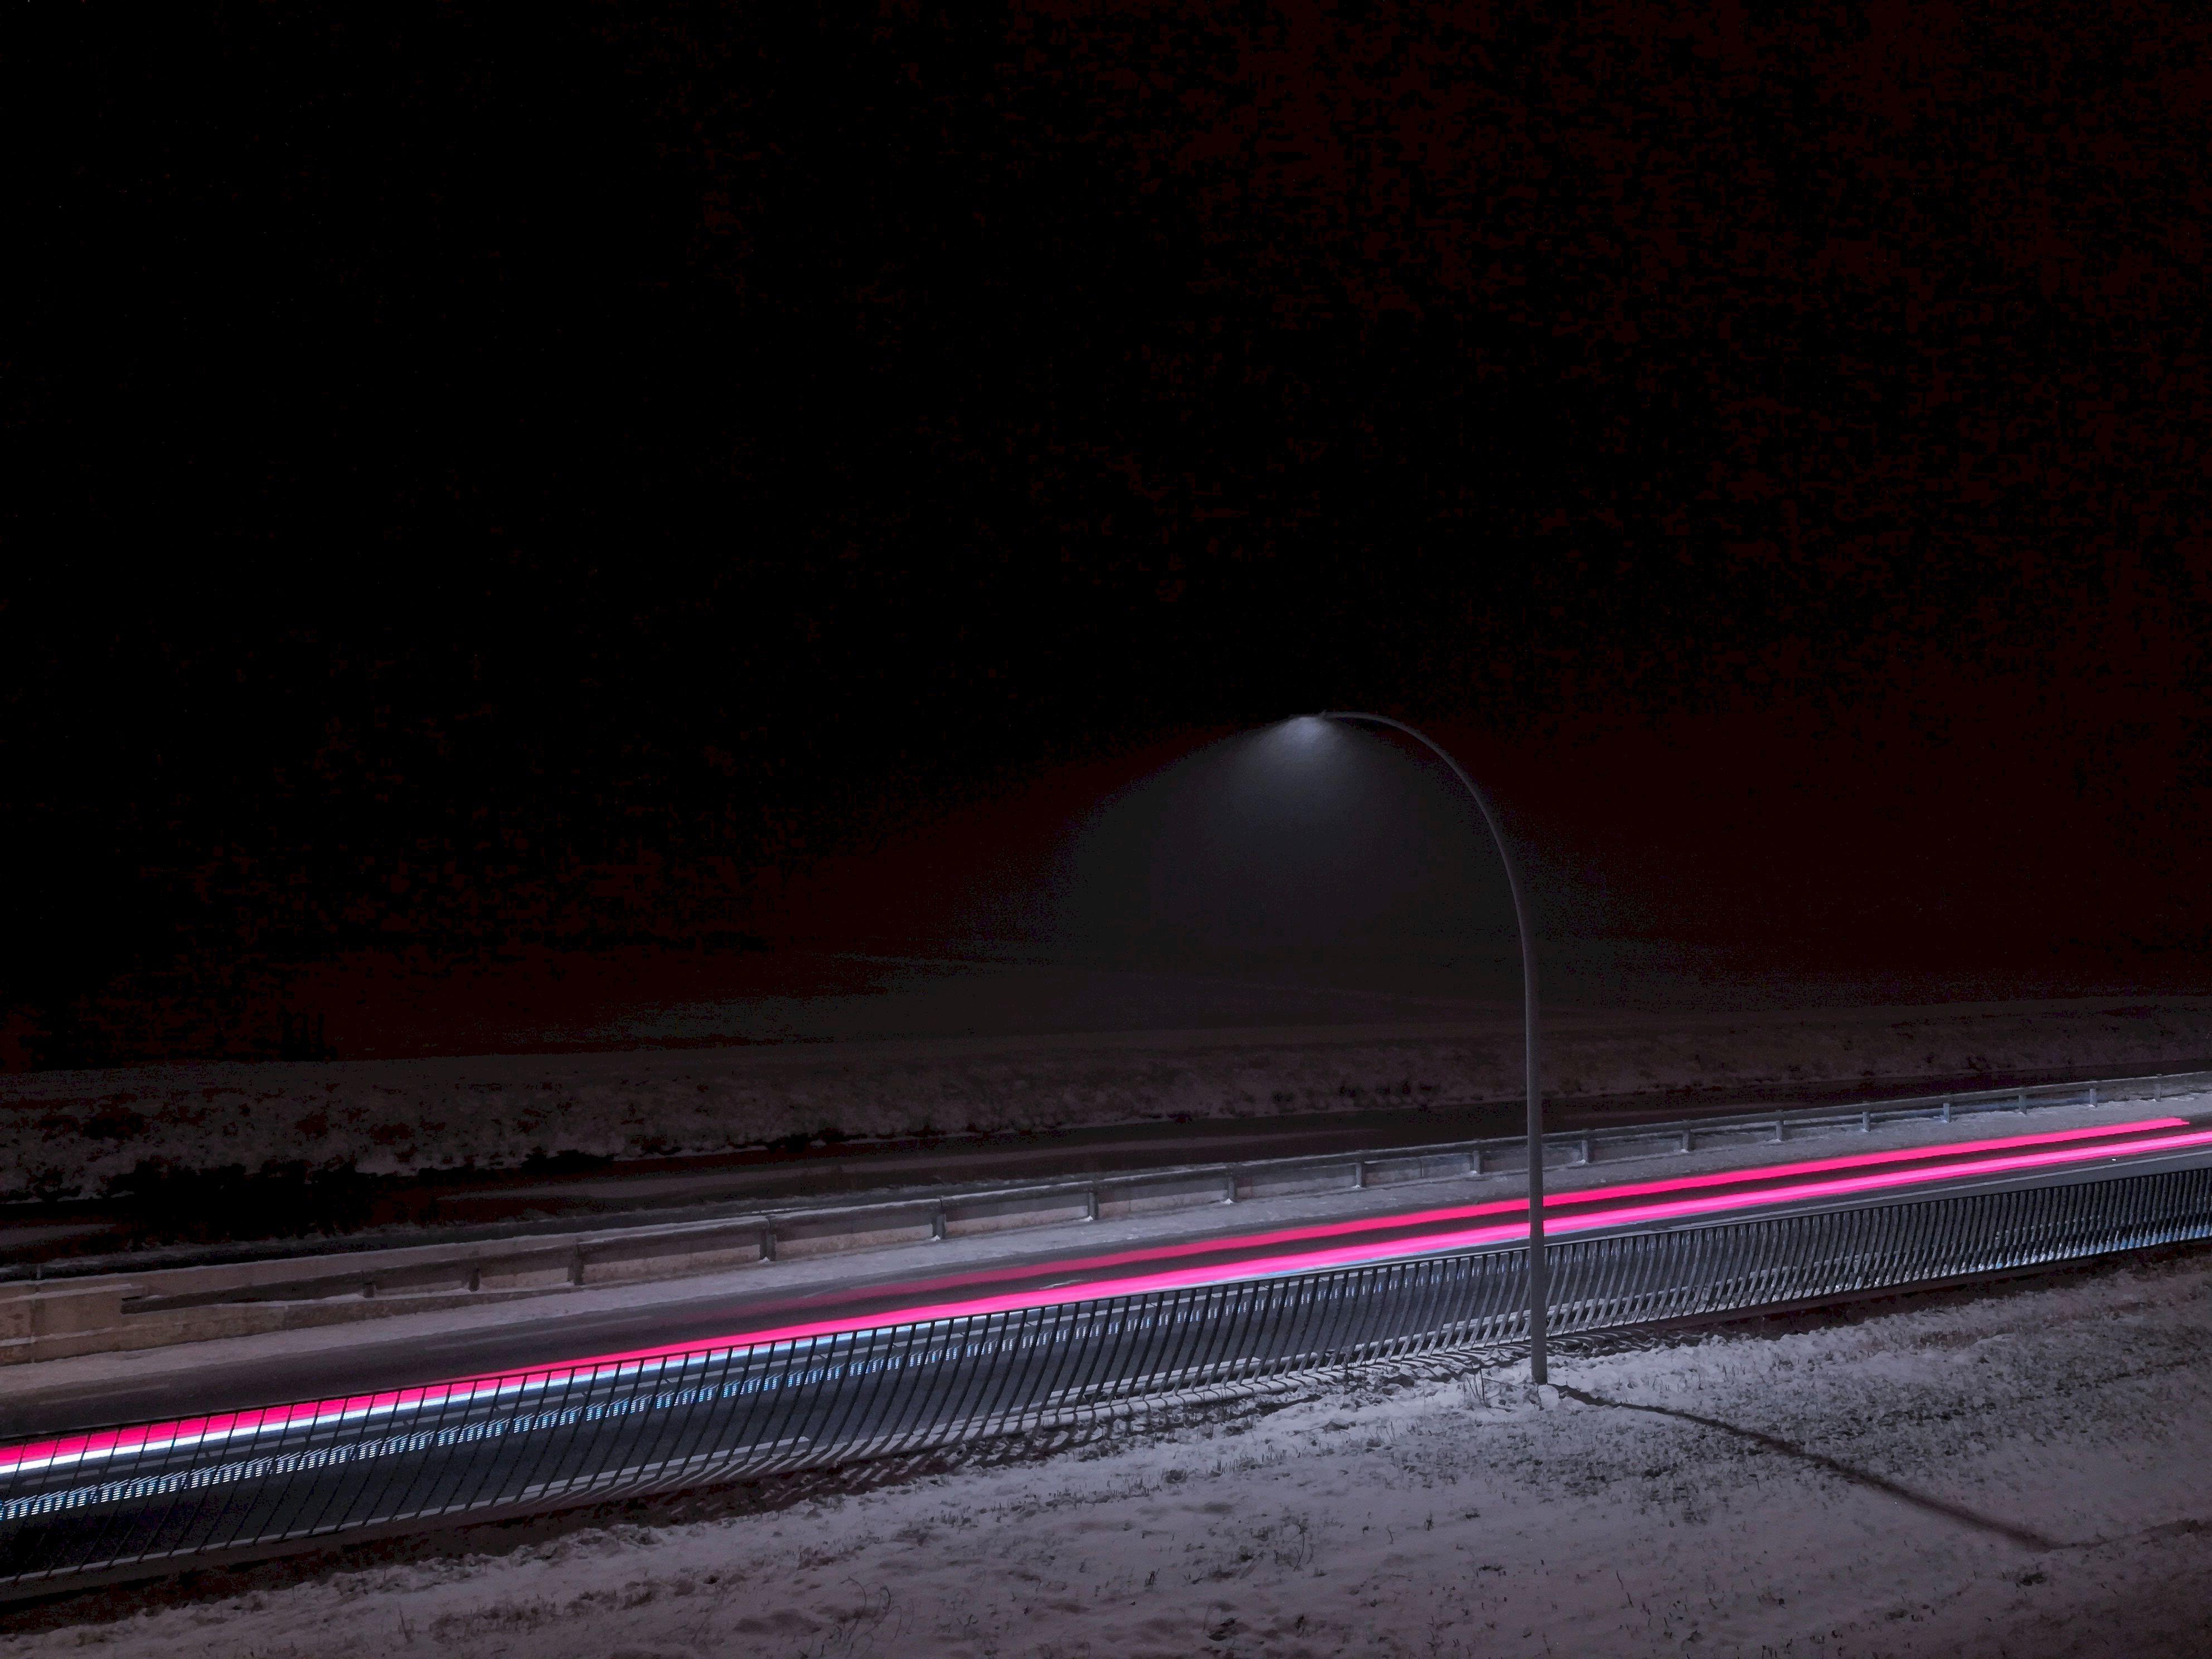 120301 download wallpaper Dark, Lamp, Lantern, Road, Long-Term Exposure, Snow screensavers and pictures for free